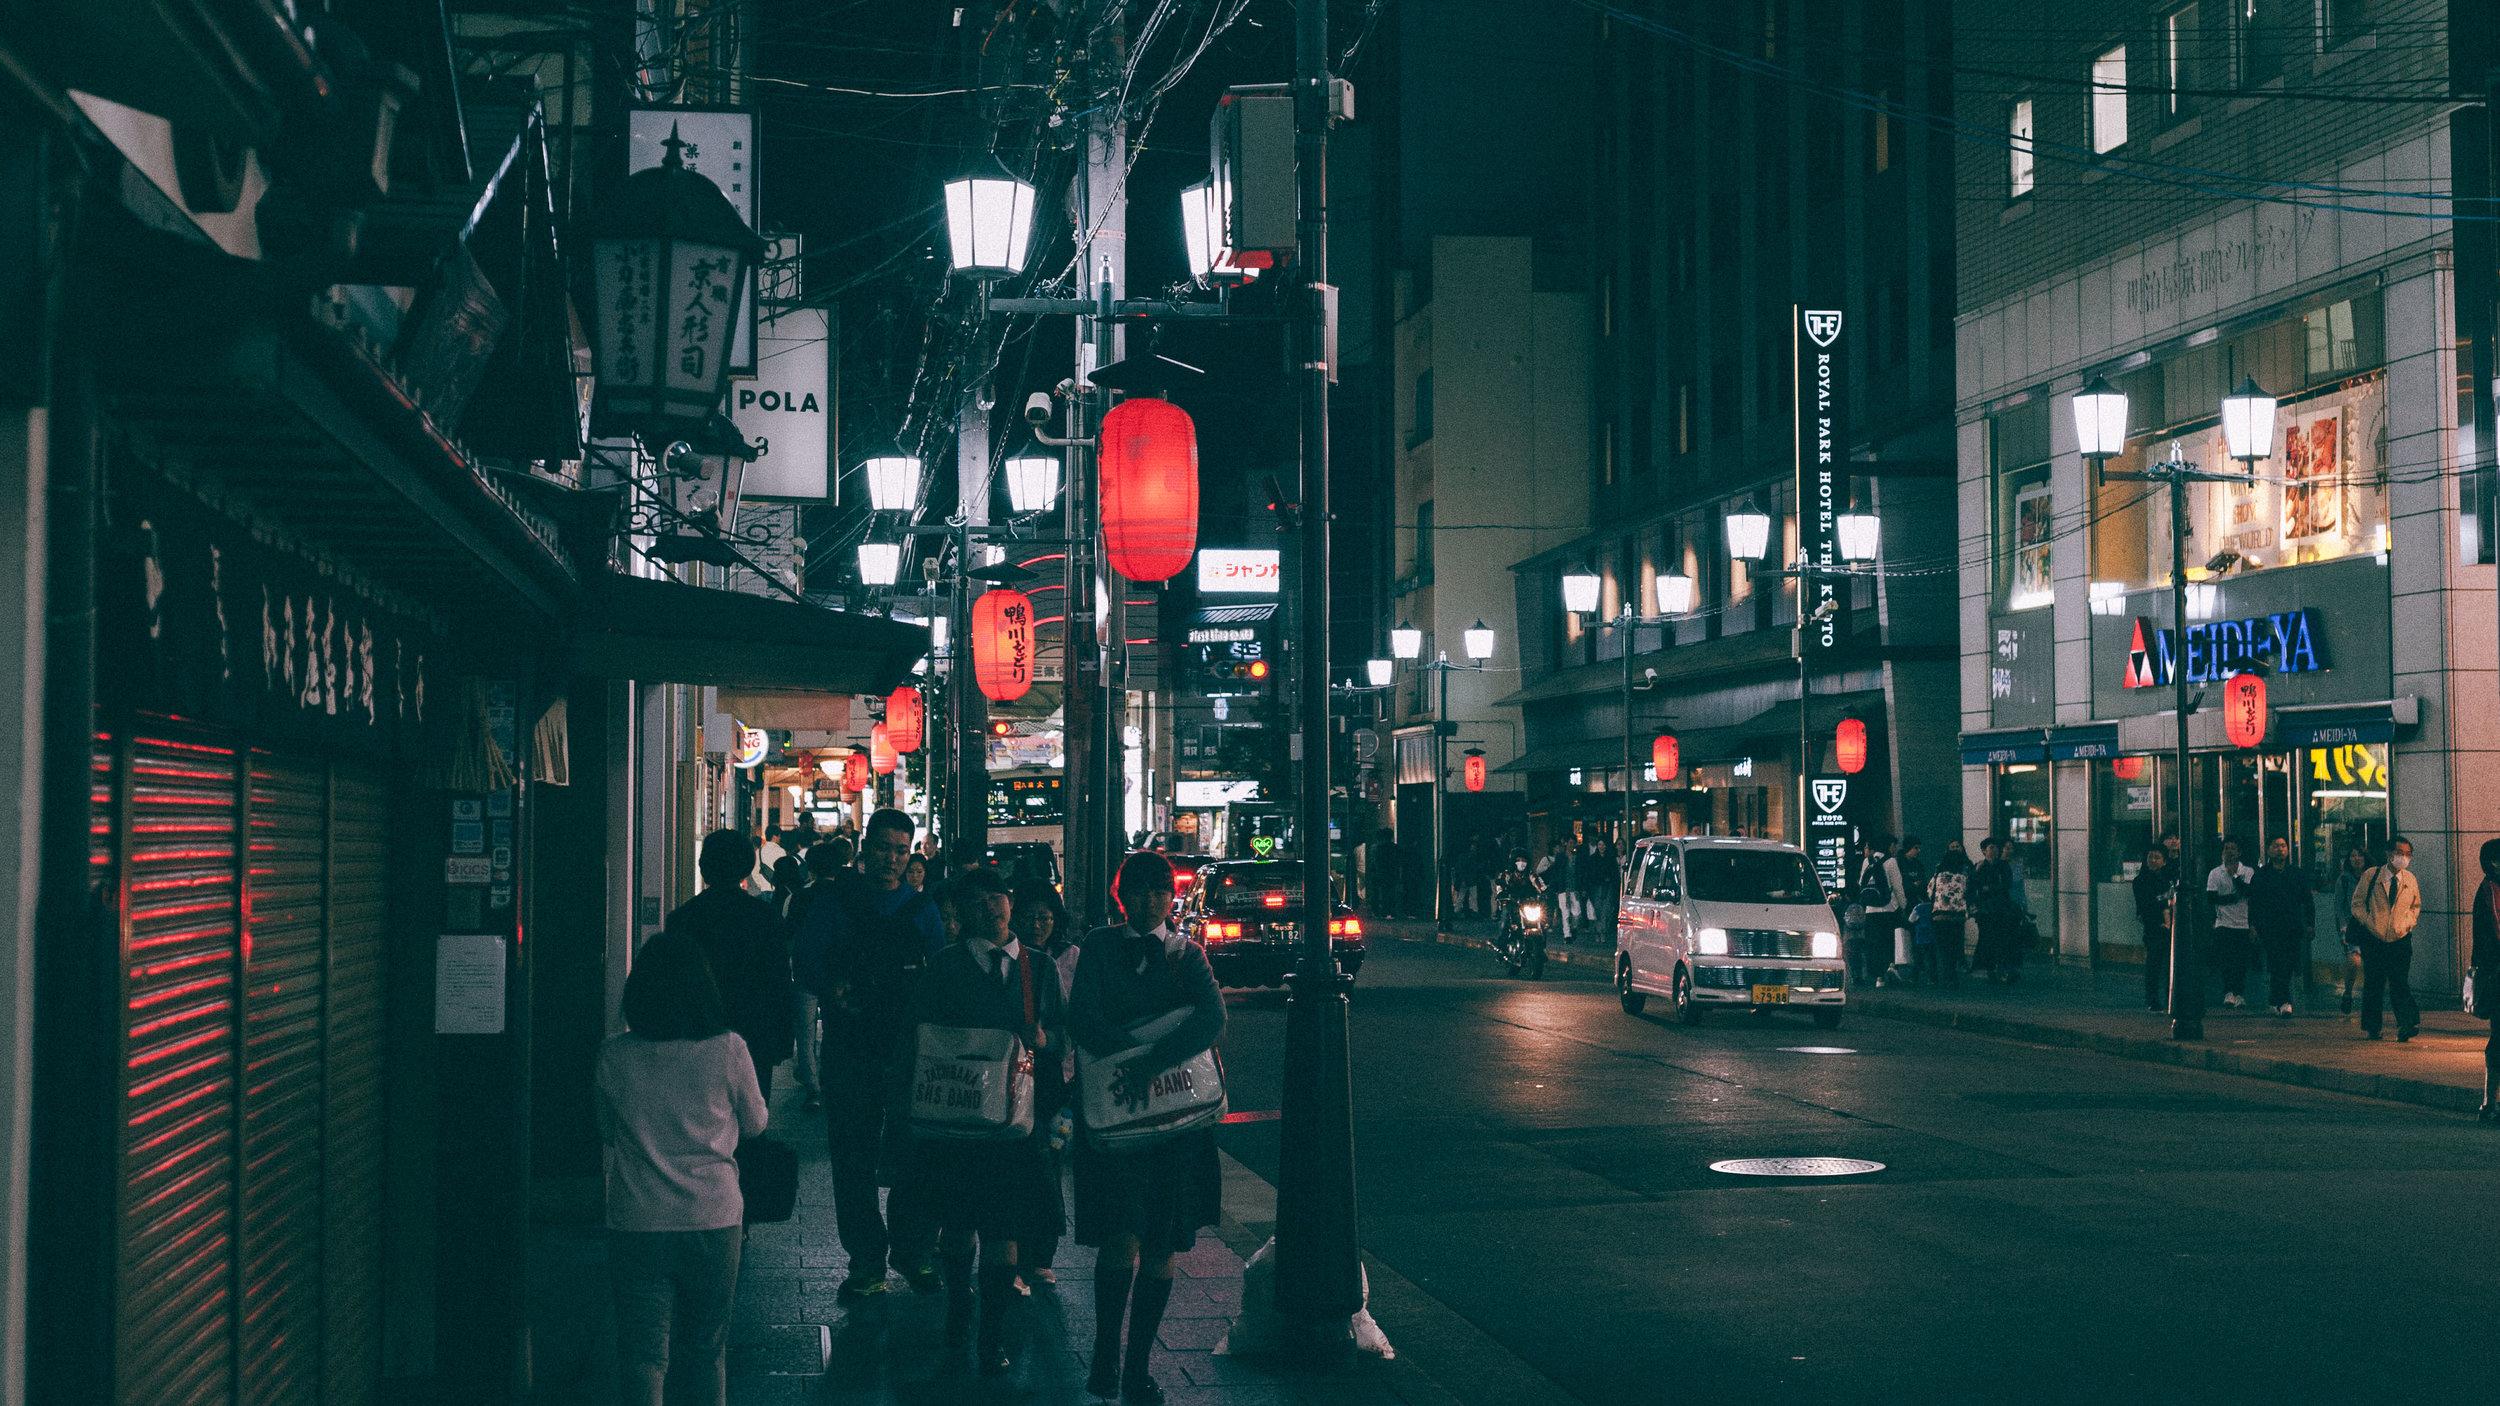 kyoto-street-night-photoraphyjpg.jpg